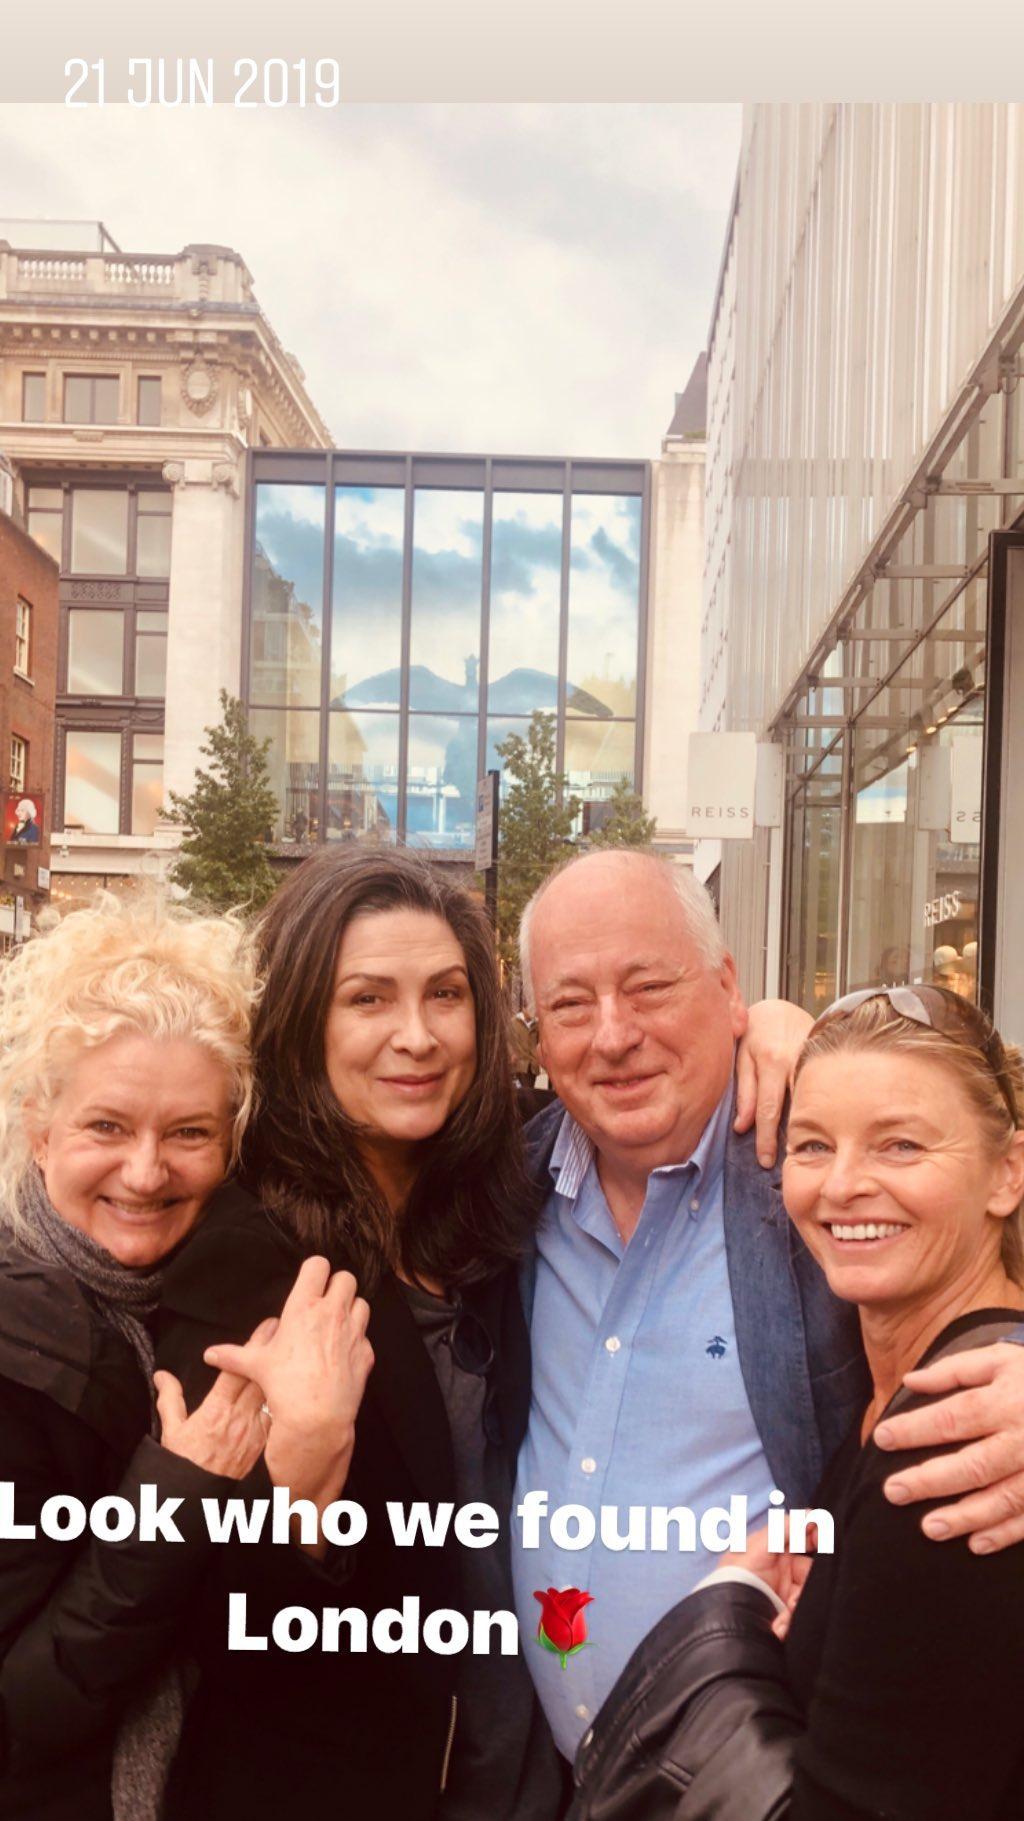 Tammy Macintosh with Pamela Rabe, Celia Ireland and Roger Hodgman in London (21 June 2019)